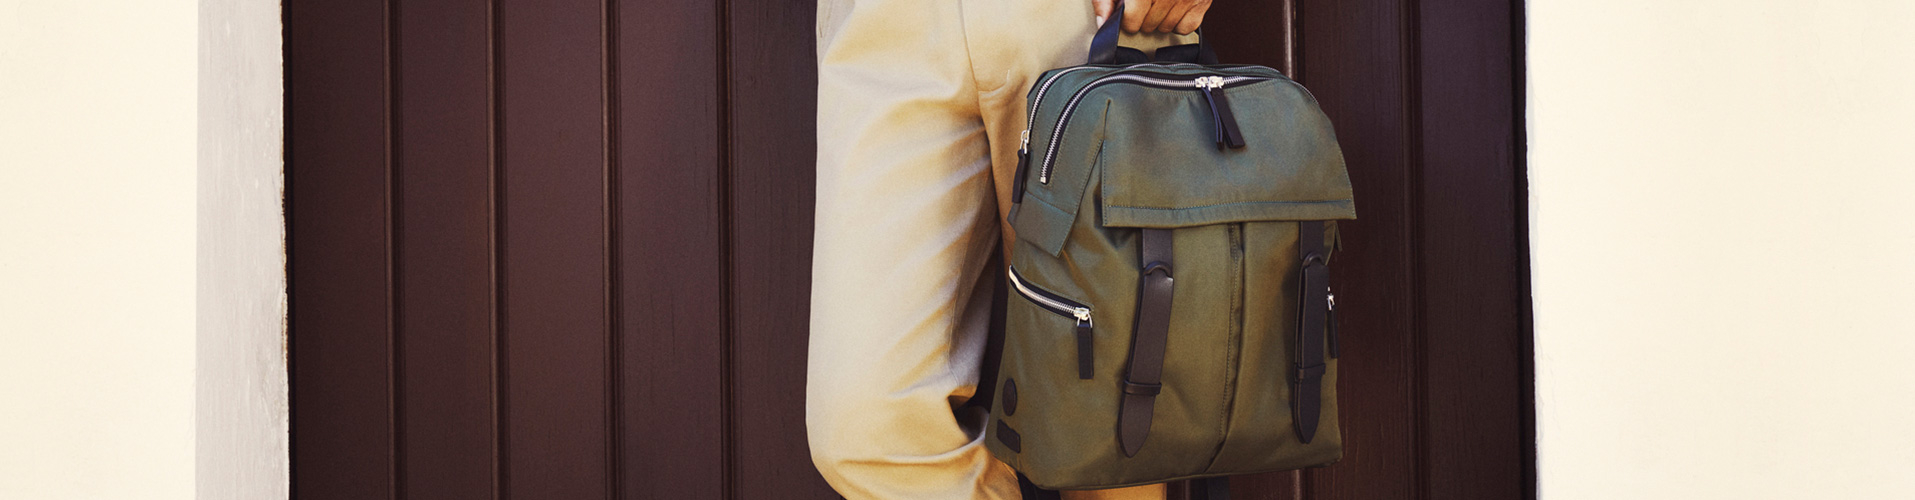 ORCIANI | NOBUCKLE Planet backpack collection | Shop online UK